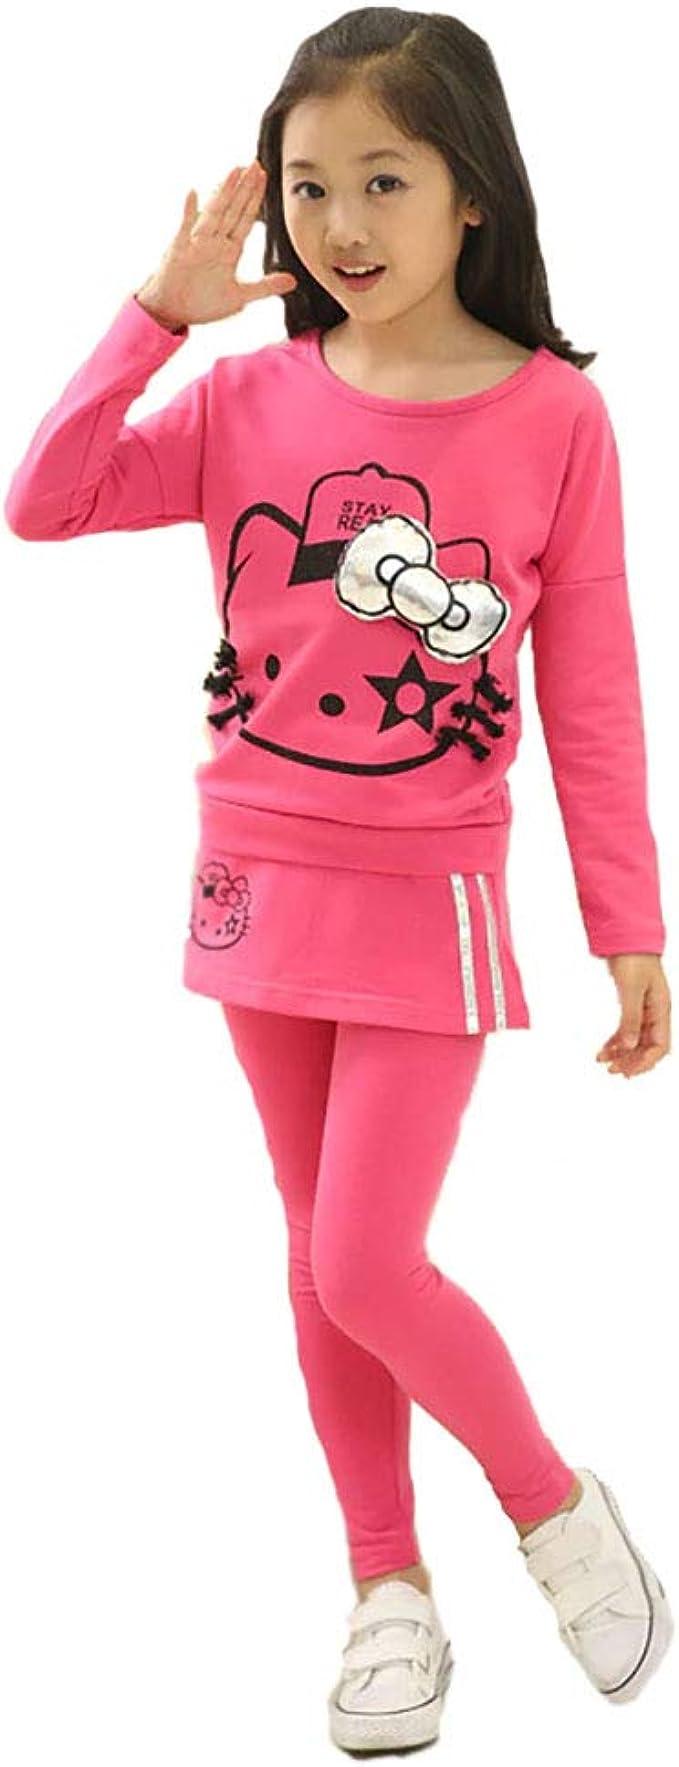 Little Girls Kitty Outfits 2pcs Suit Cotton Sport Sets T-shirt Pants Pink